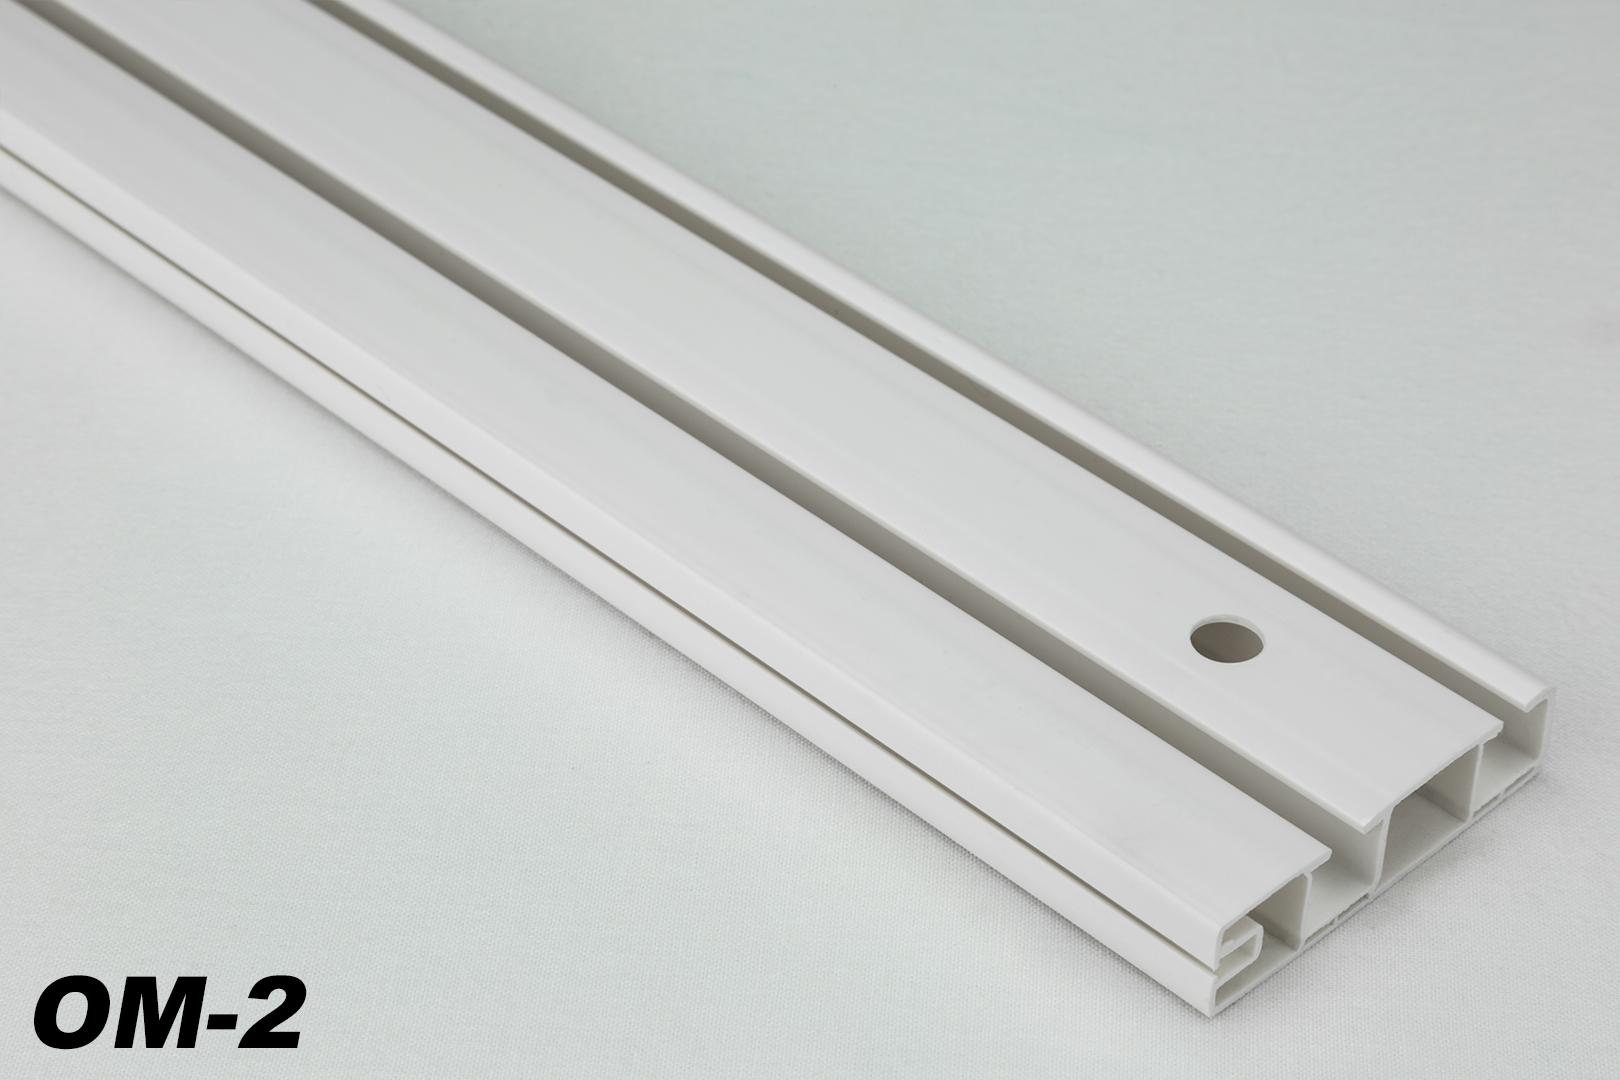 Binari Tende A Soffitto : 10 metri 2 läufige pvc binari tende tenda a pannello tavole per